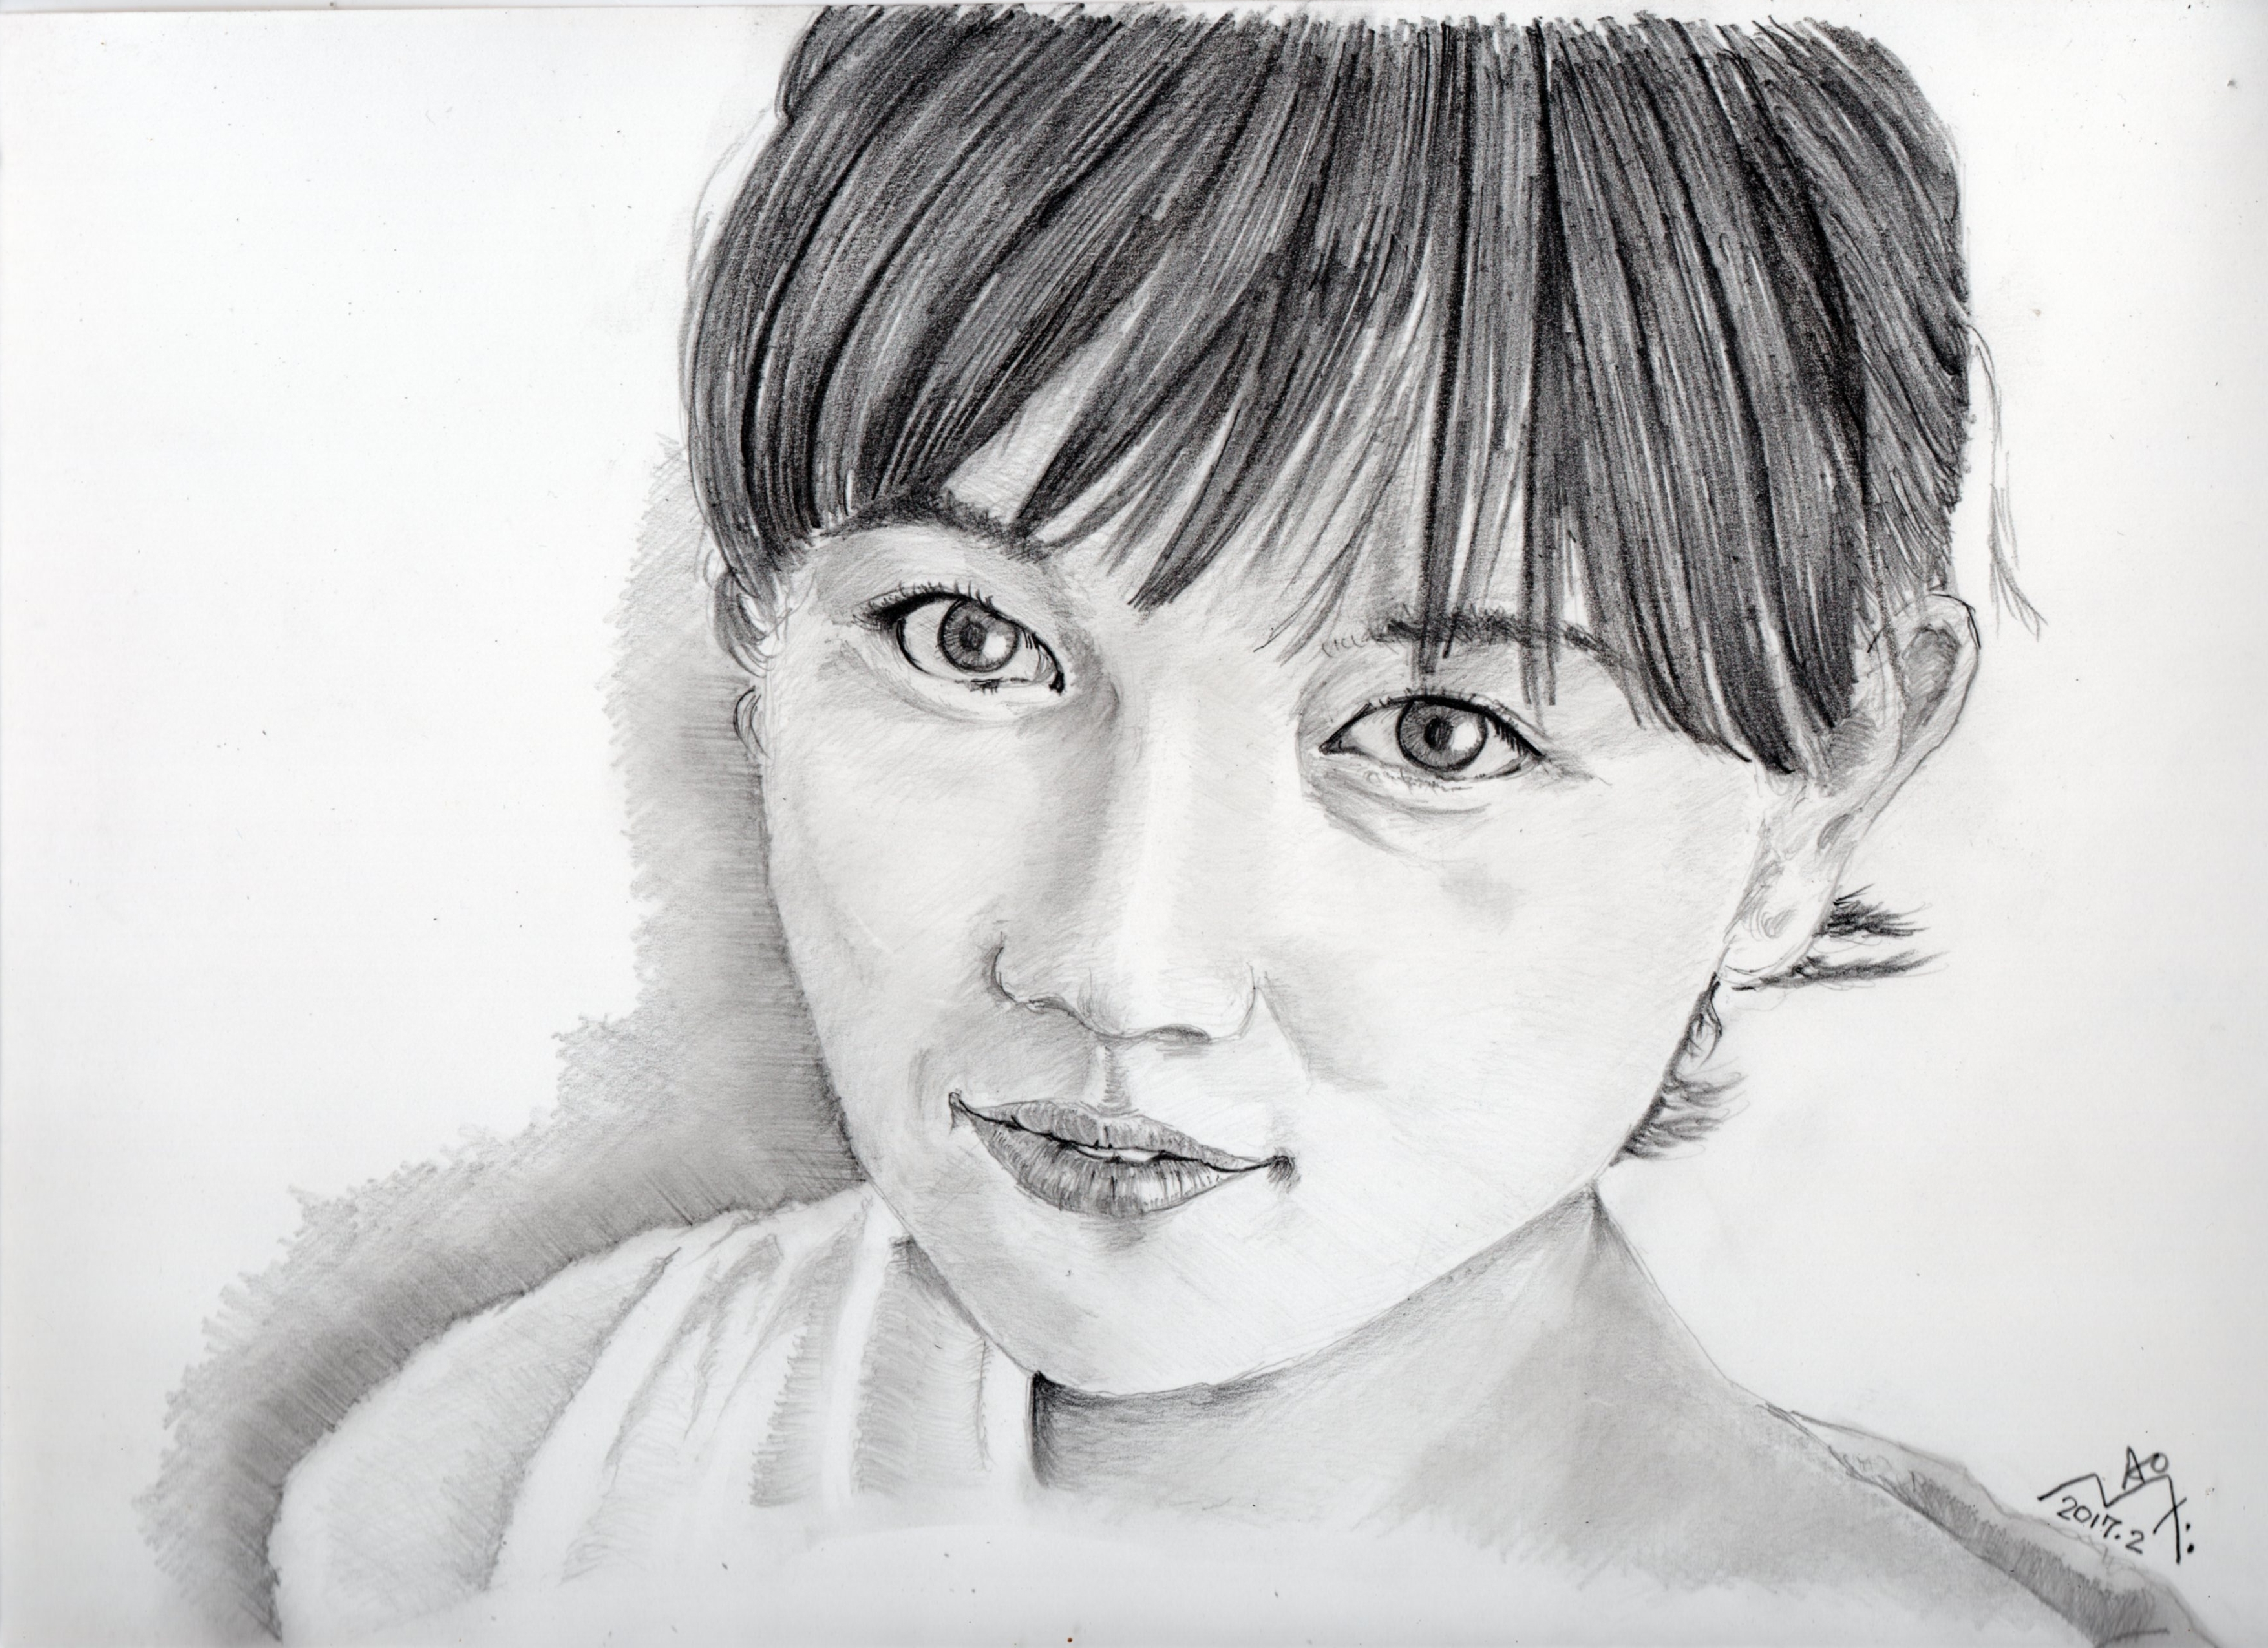 川口春奈の鉛筆画似顔絵